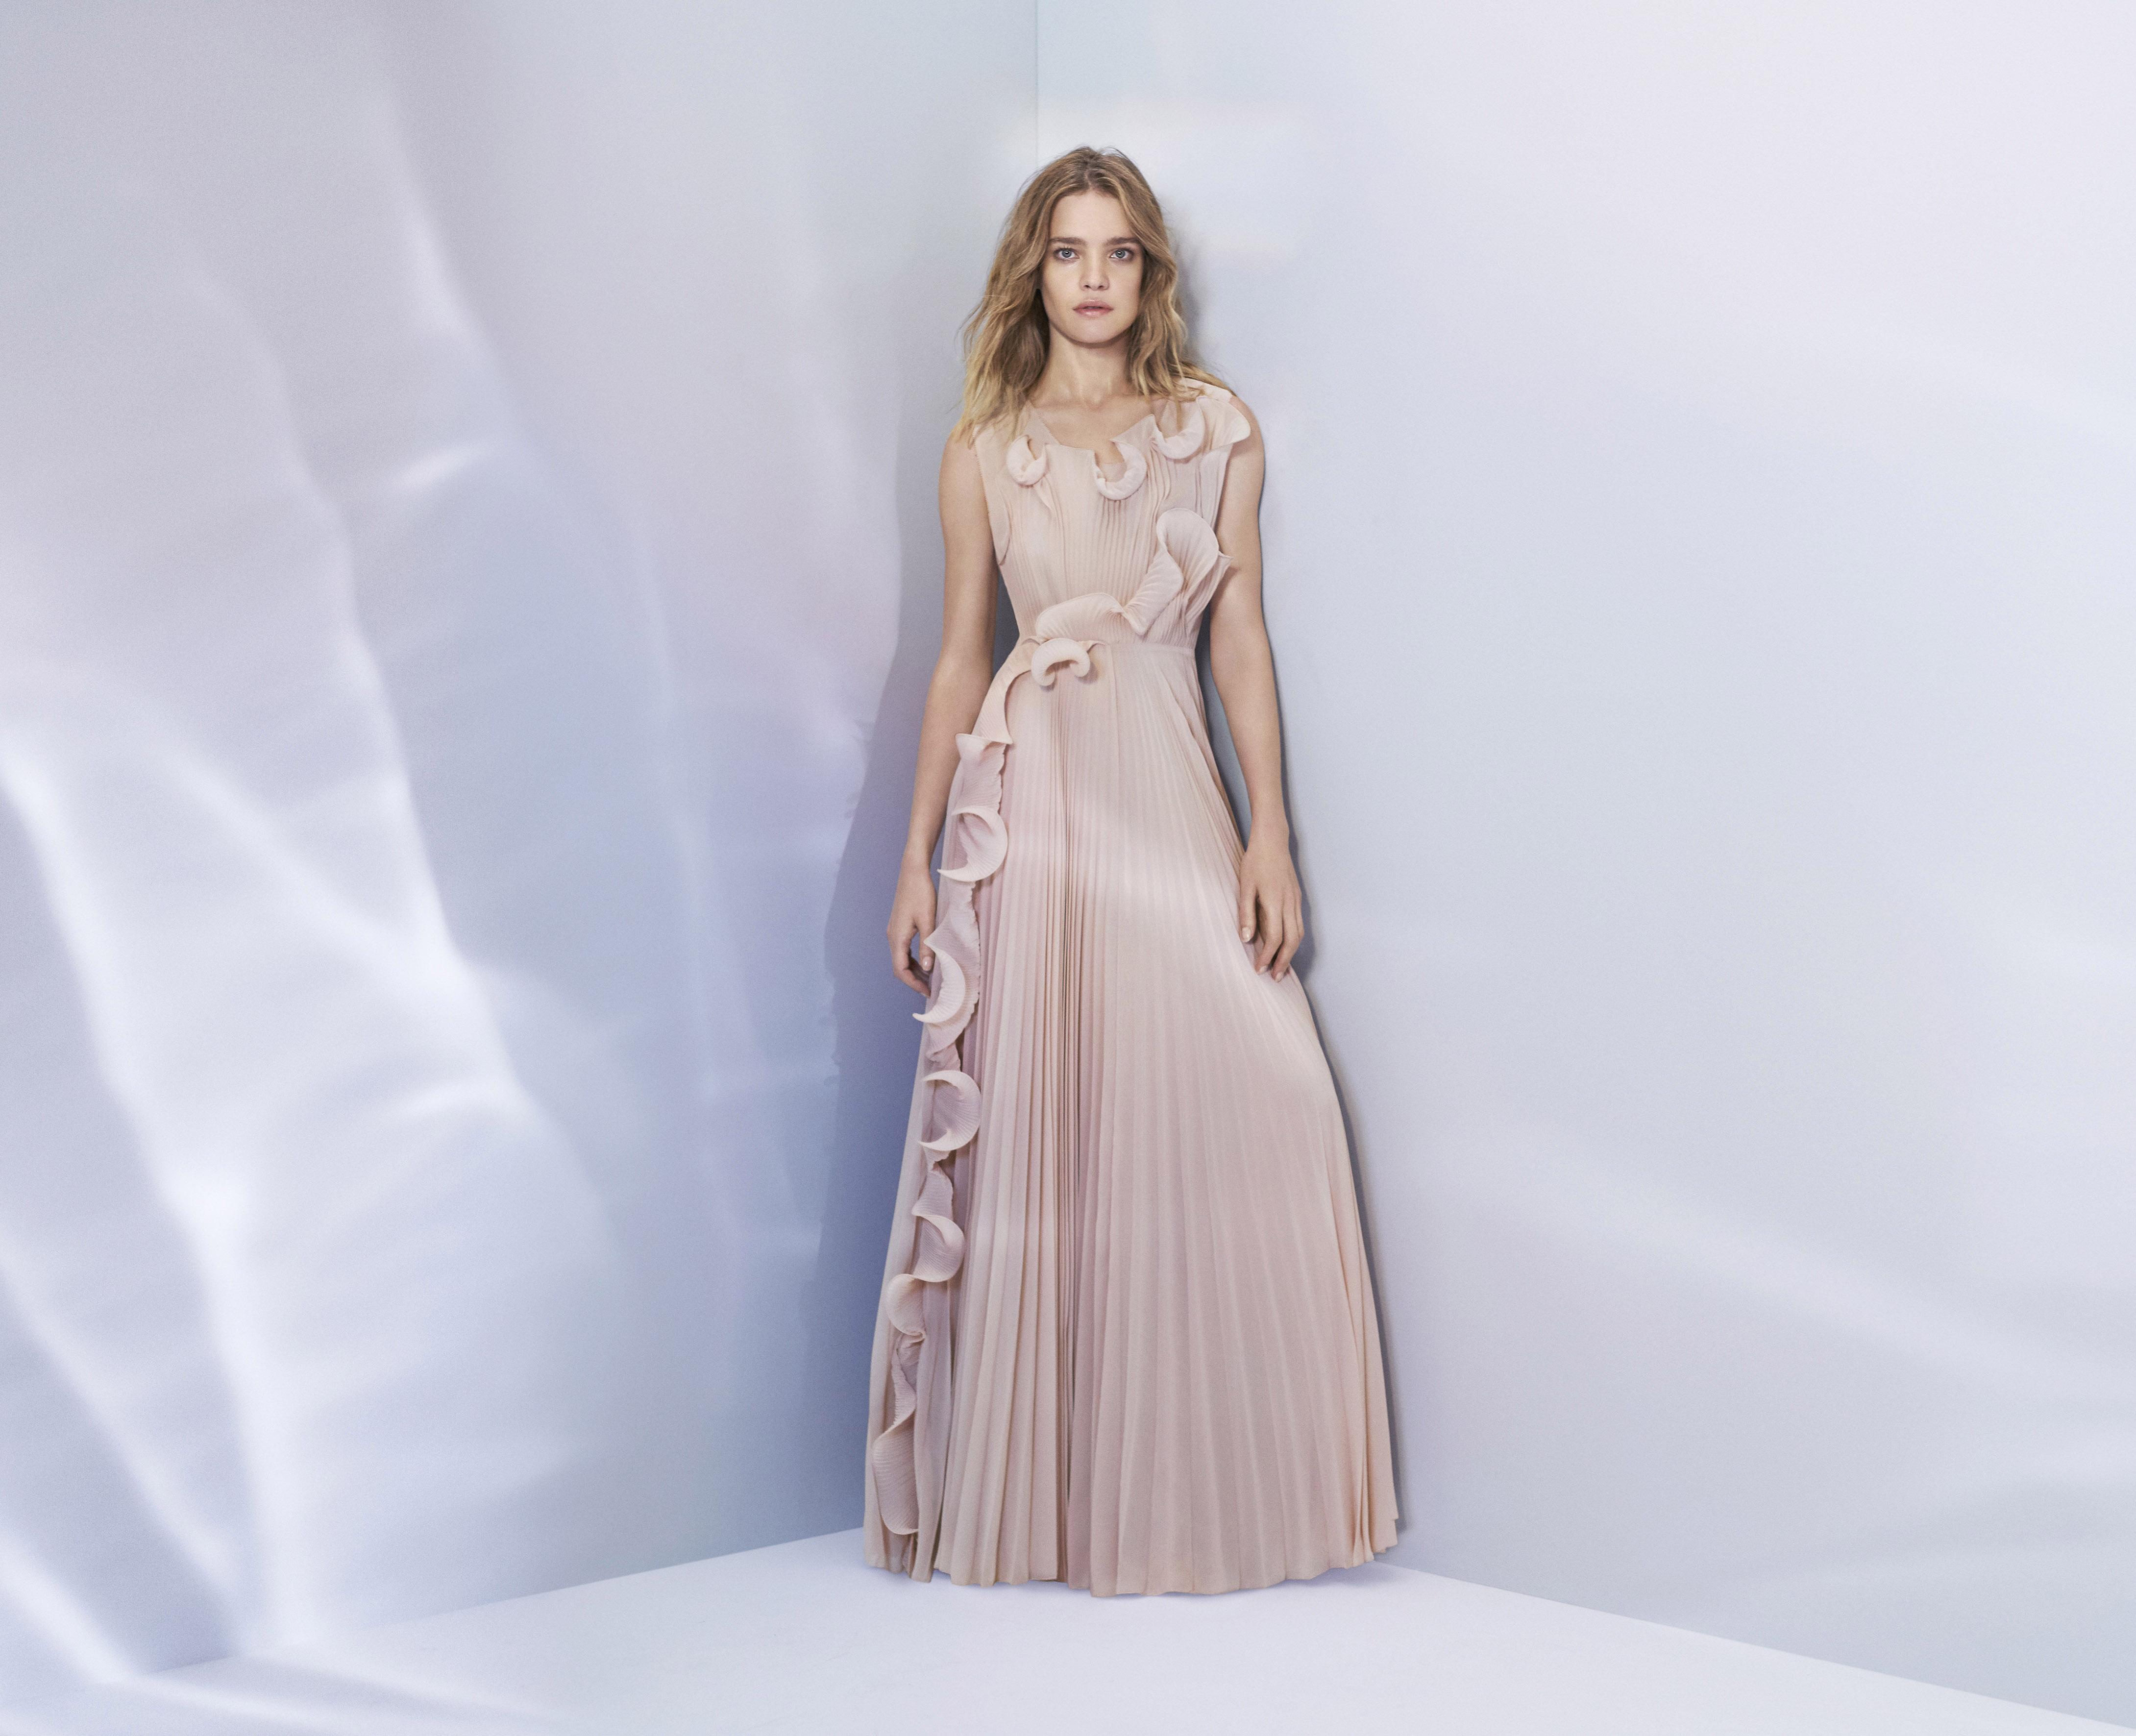 Natalia Vodianova v nové kampani H&M Conscious